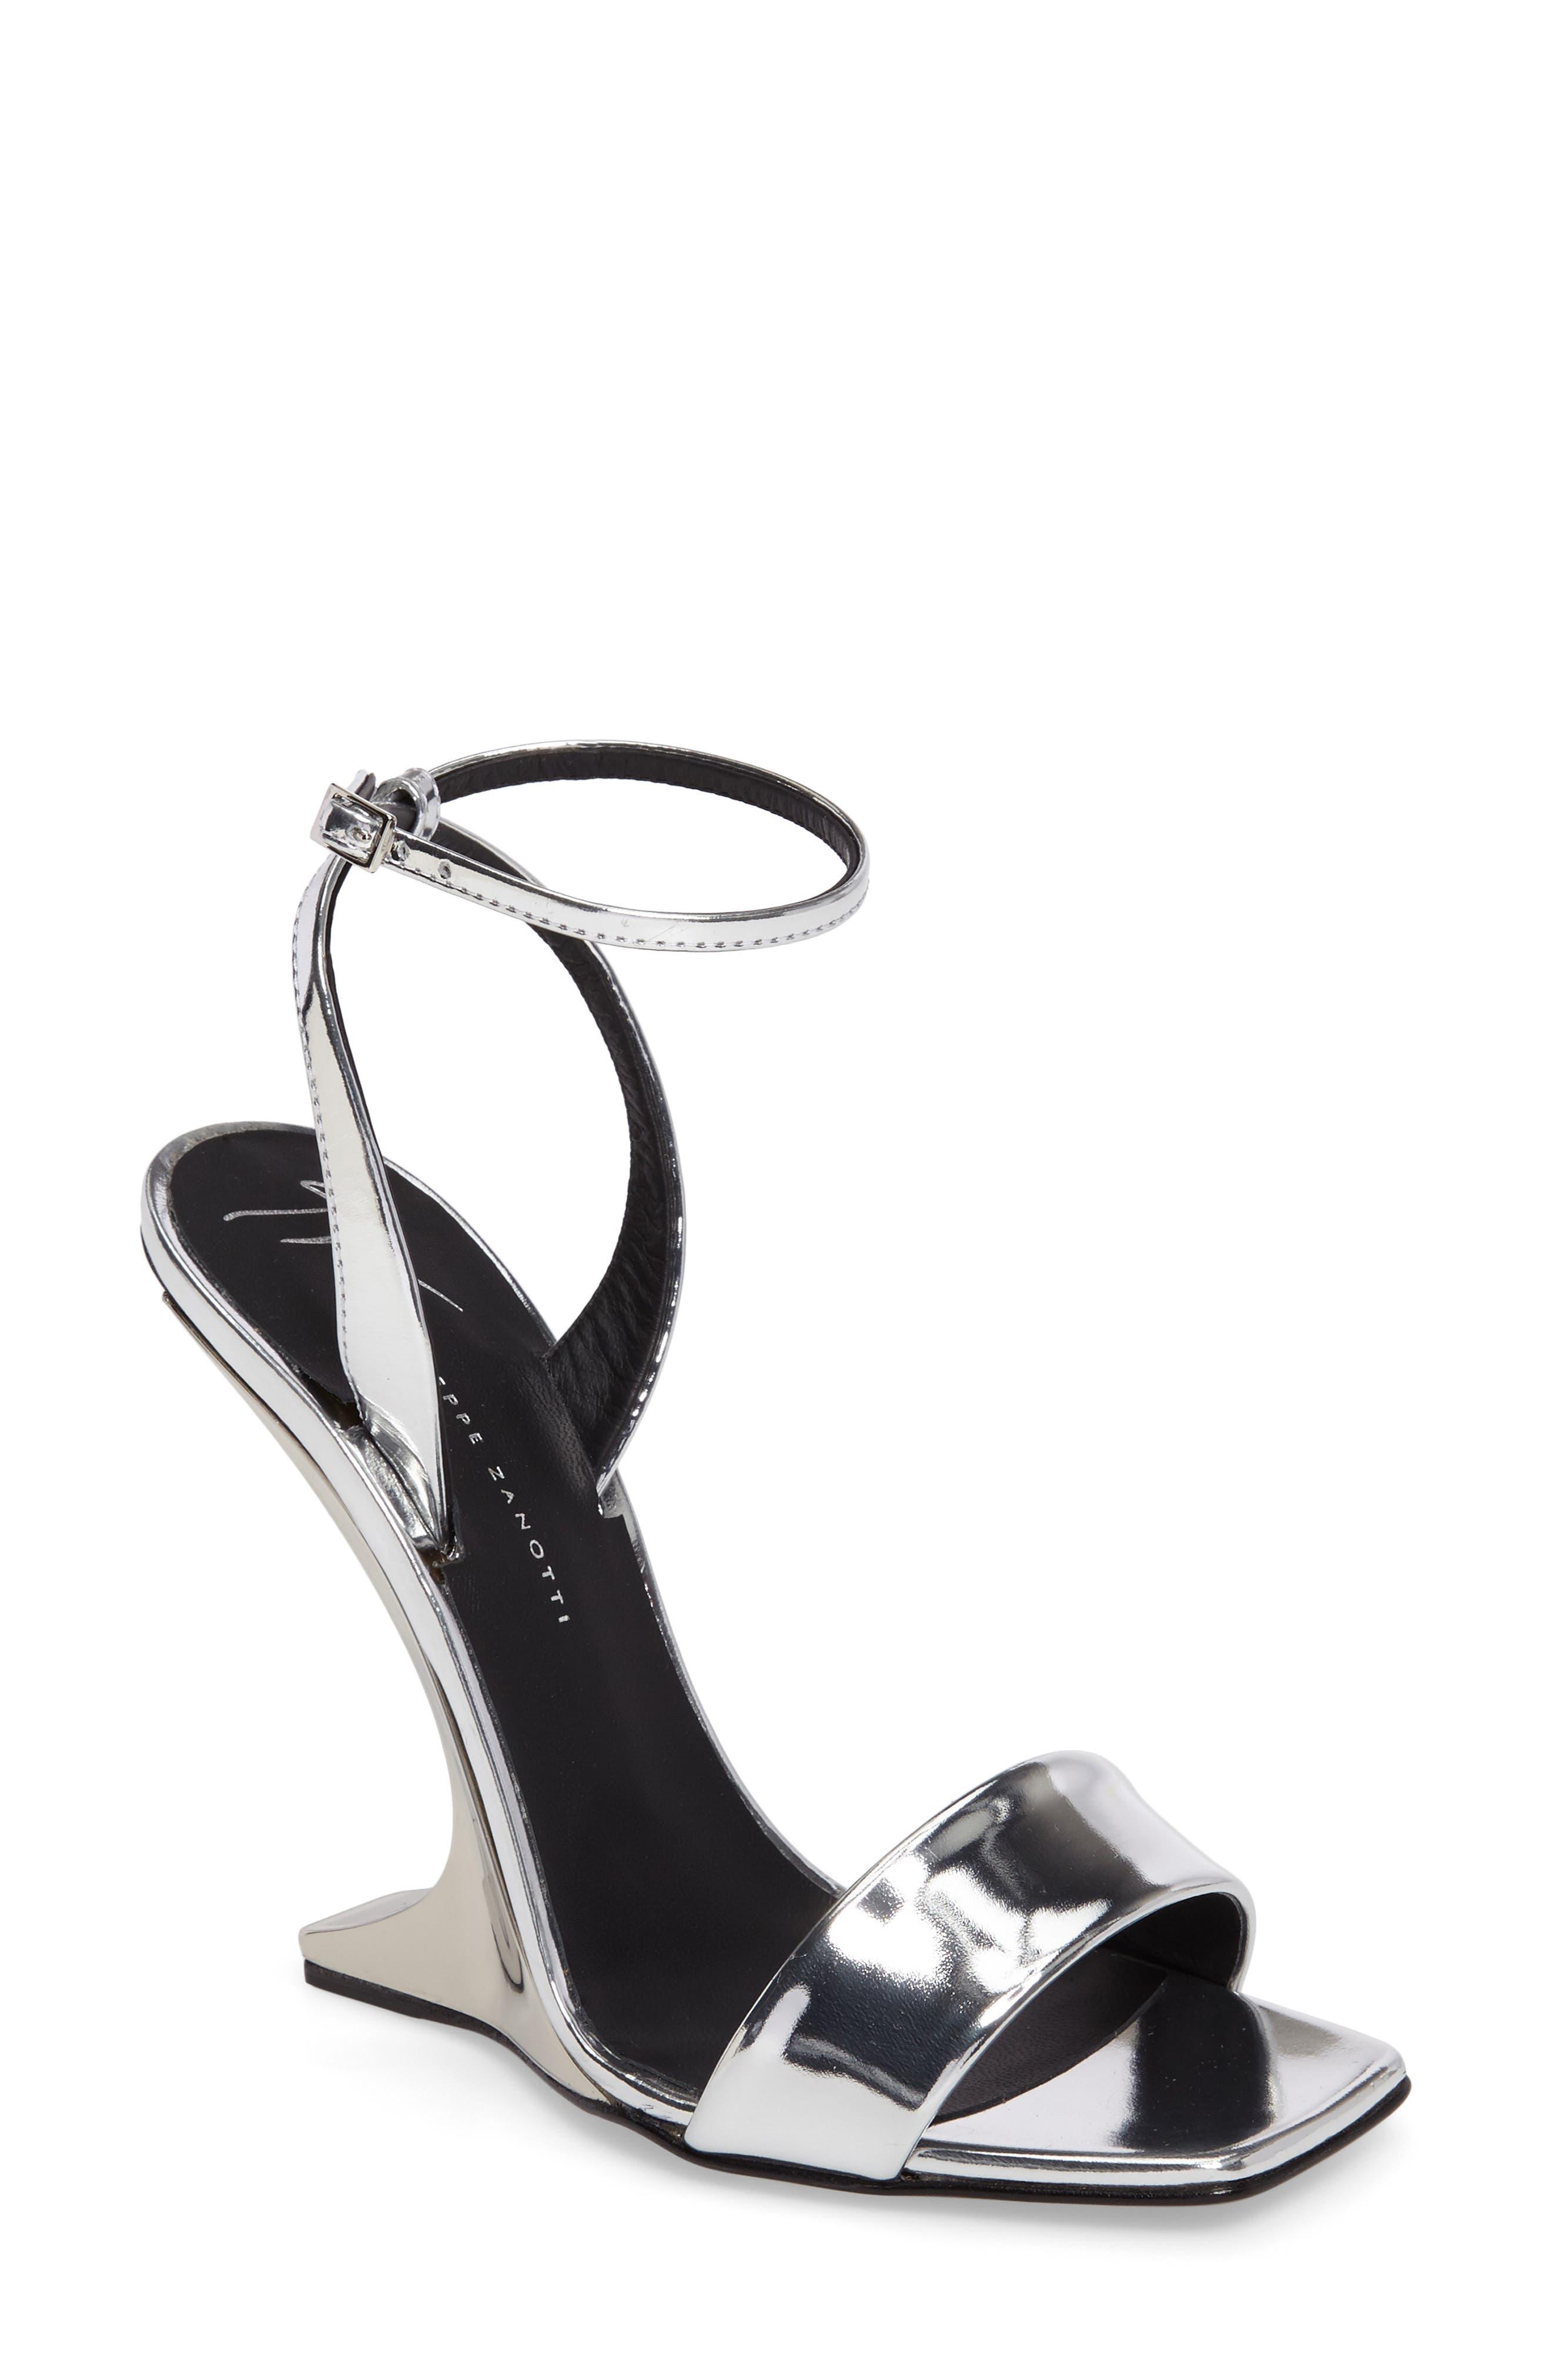 Main Image - Giuseppe Zanotti Wedge Sandal (Women)